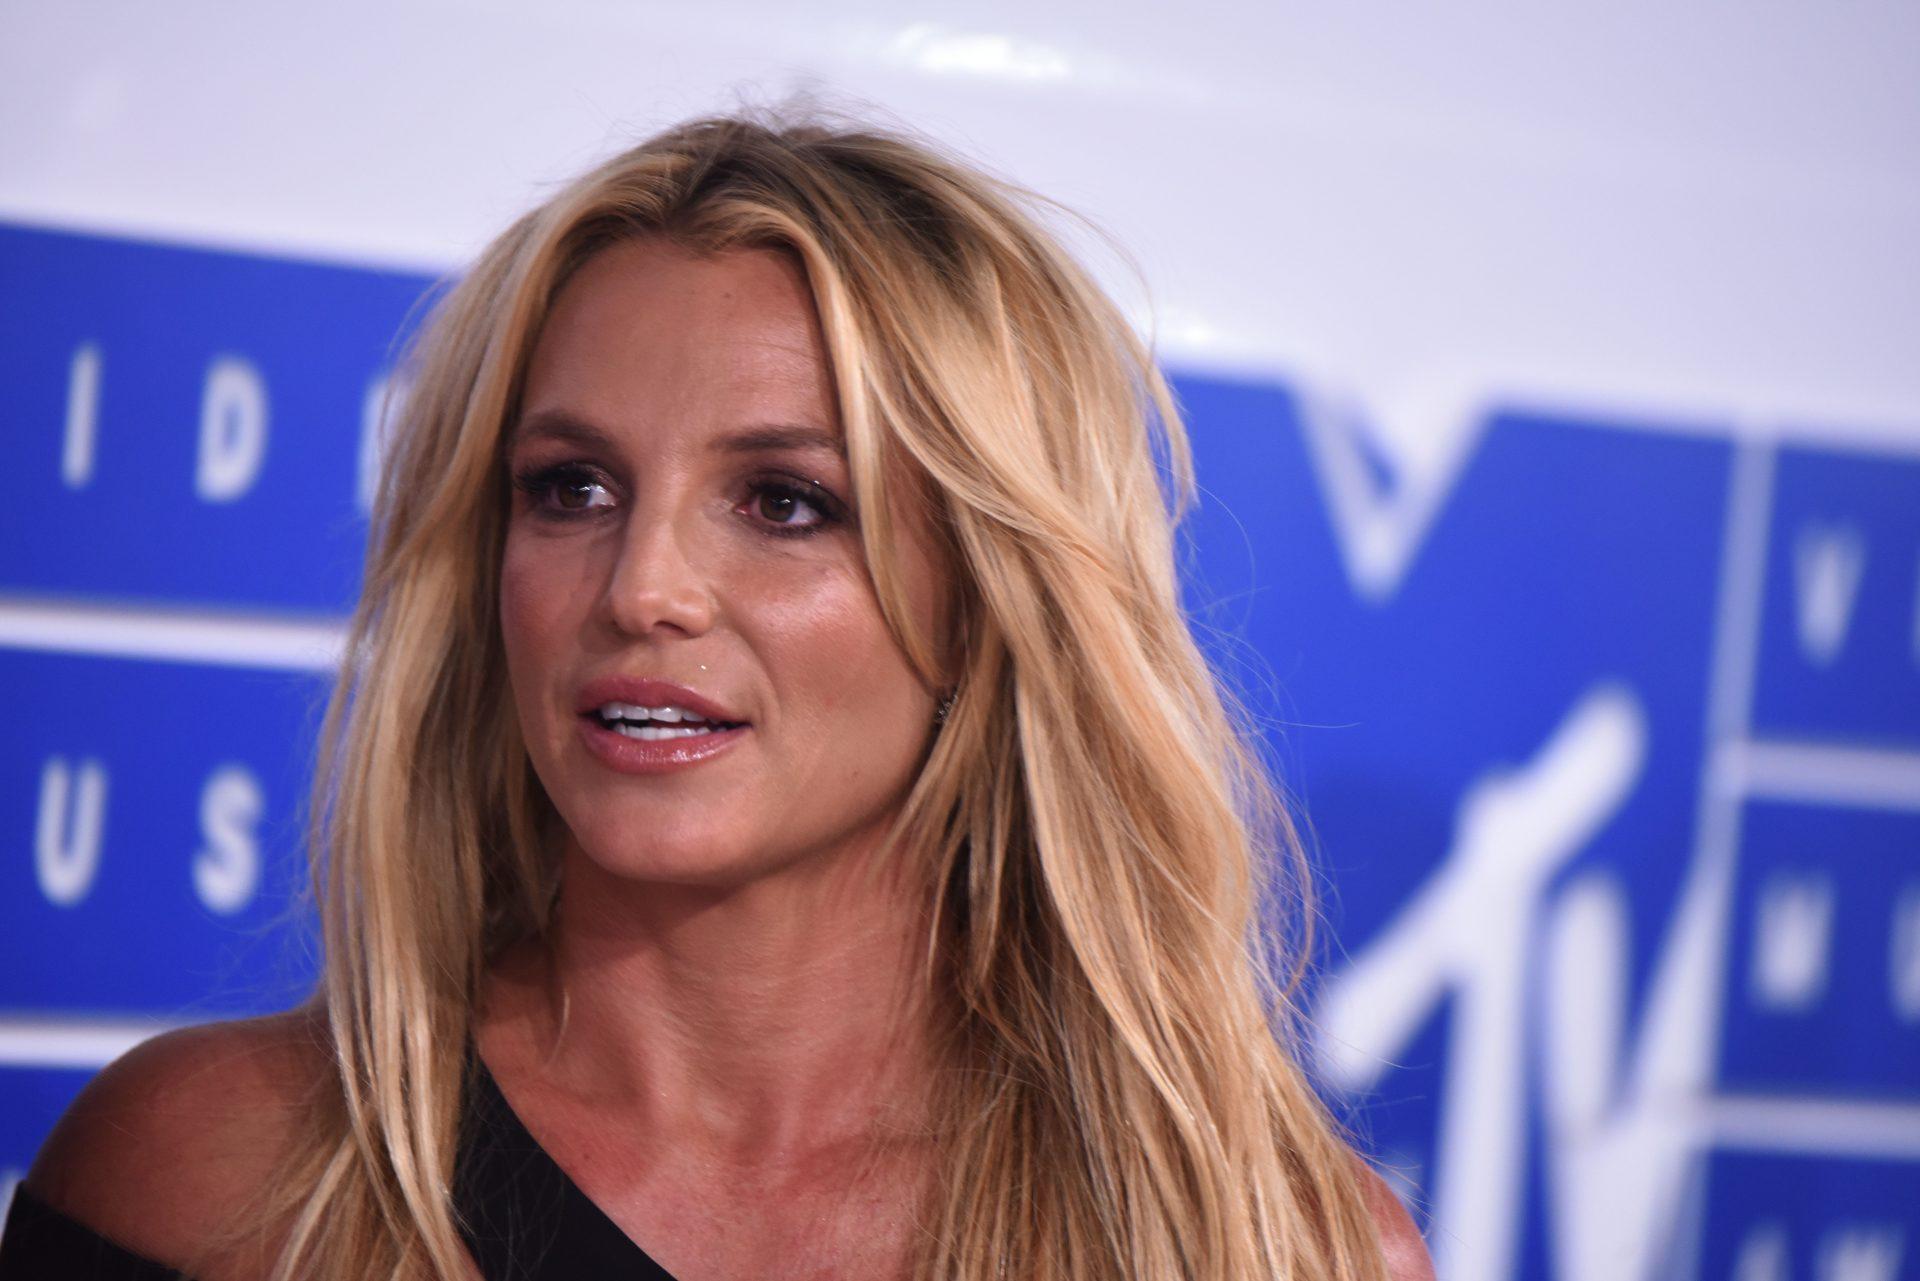 Mandatory Credit: Photo by Stephen Lovekin/Shutterstock (5848733gz)Britney Spears2016 MTV Video Music Awards, Arrivals, Madison Square Garden, New York, USA - 28 Aug 2016.